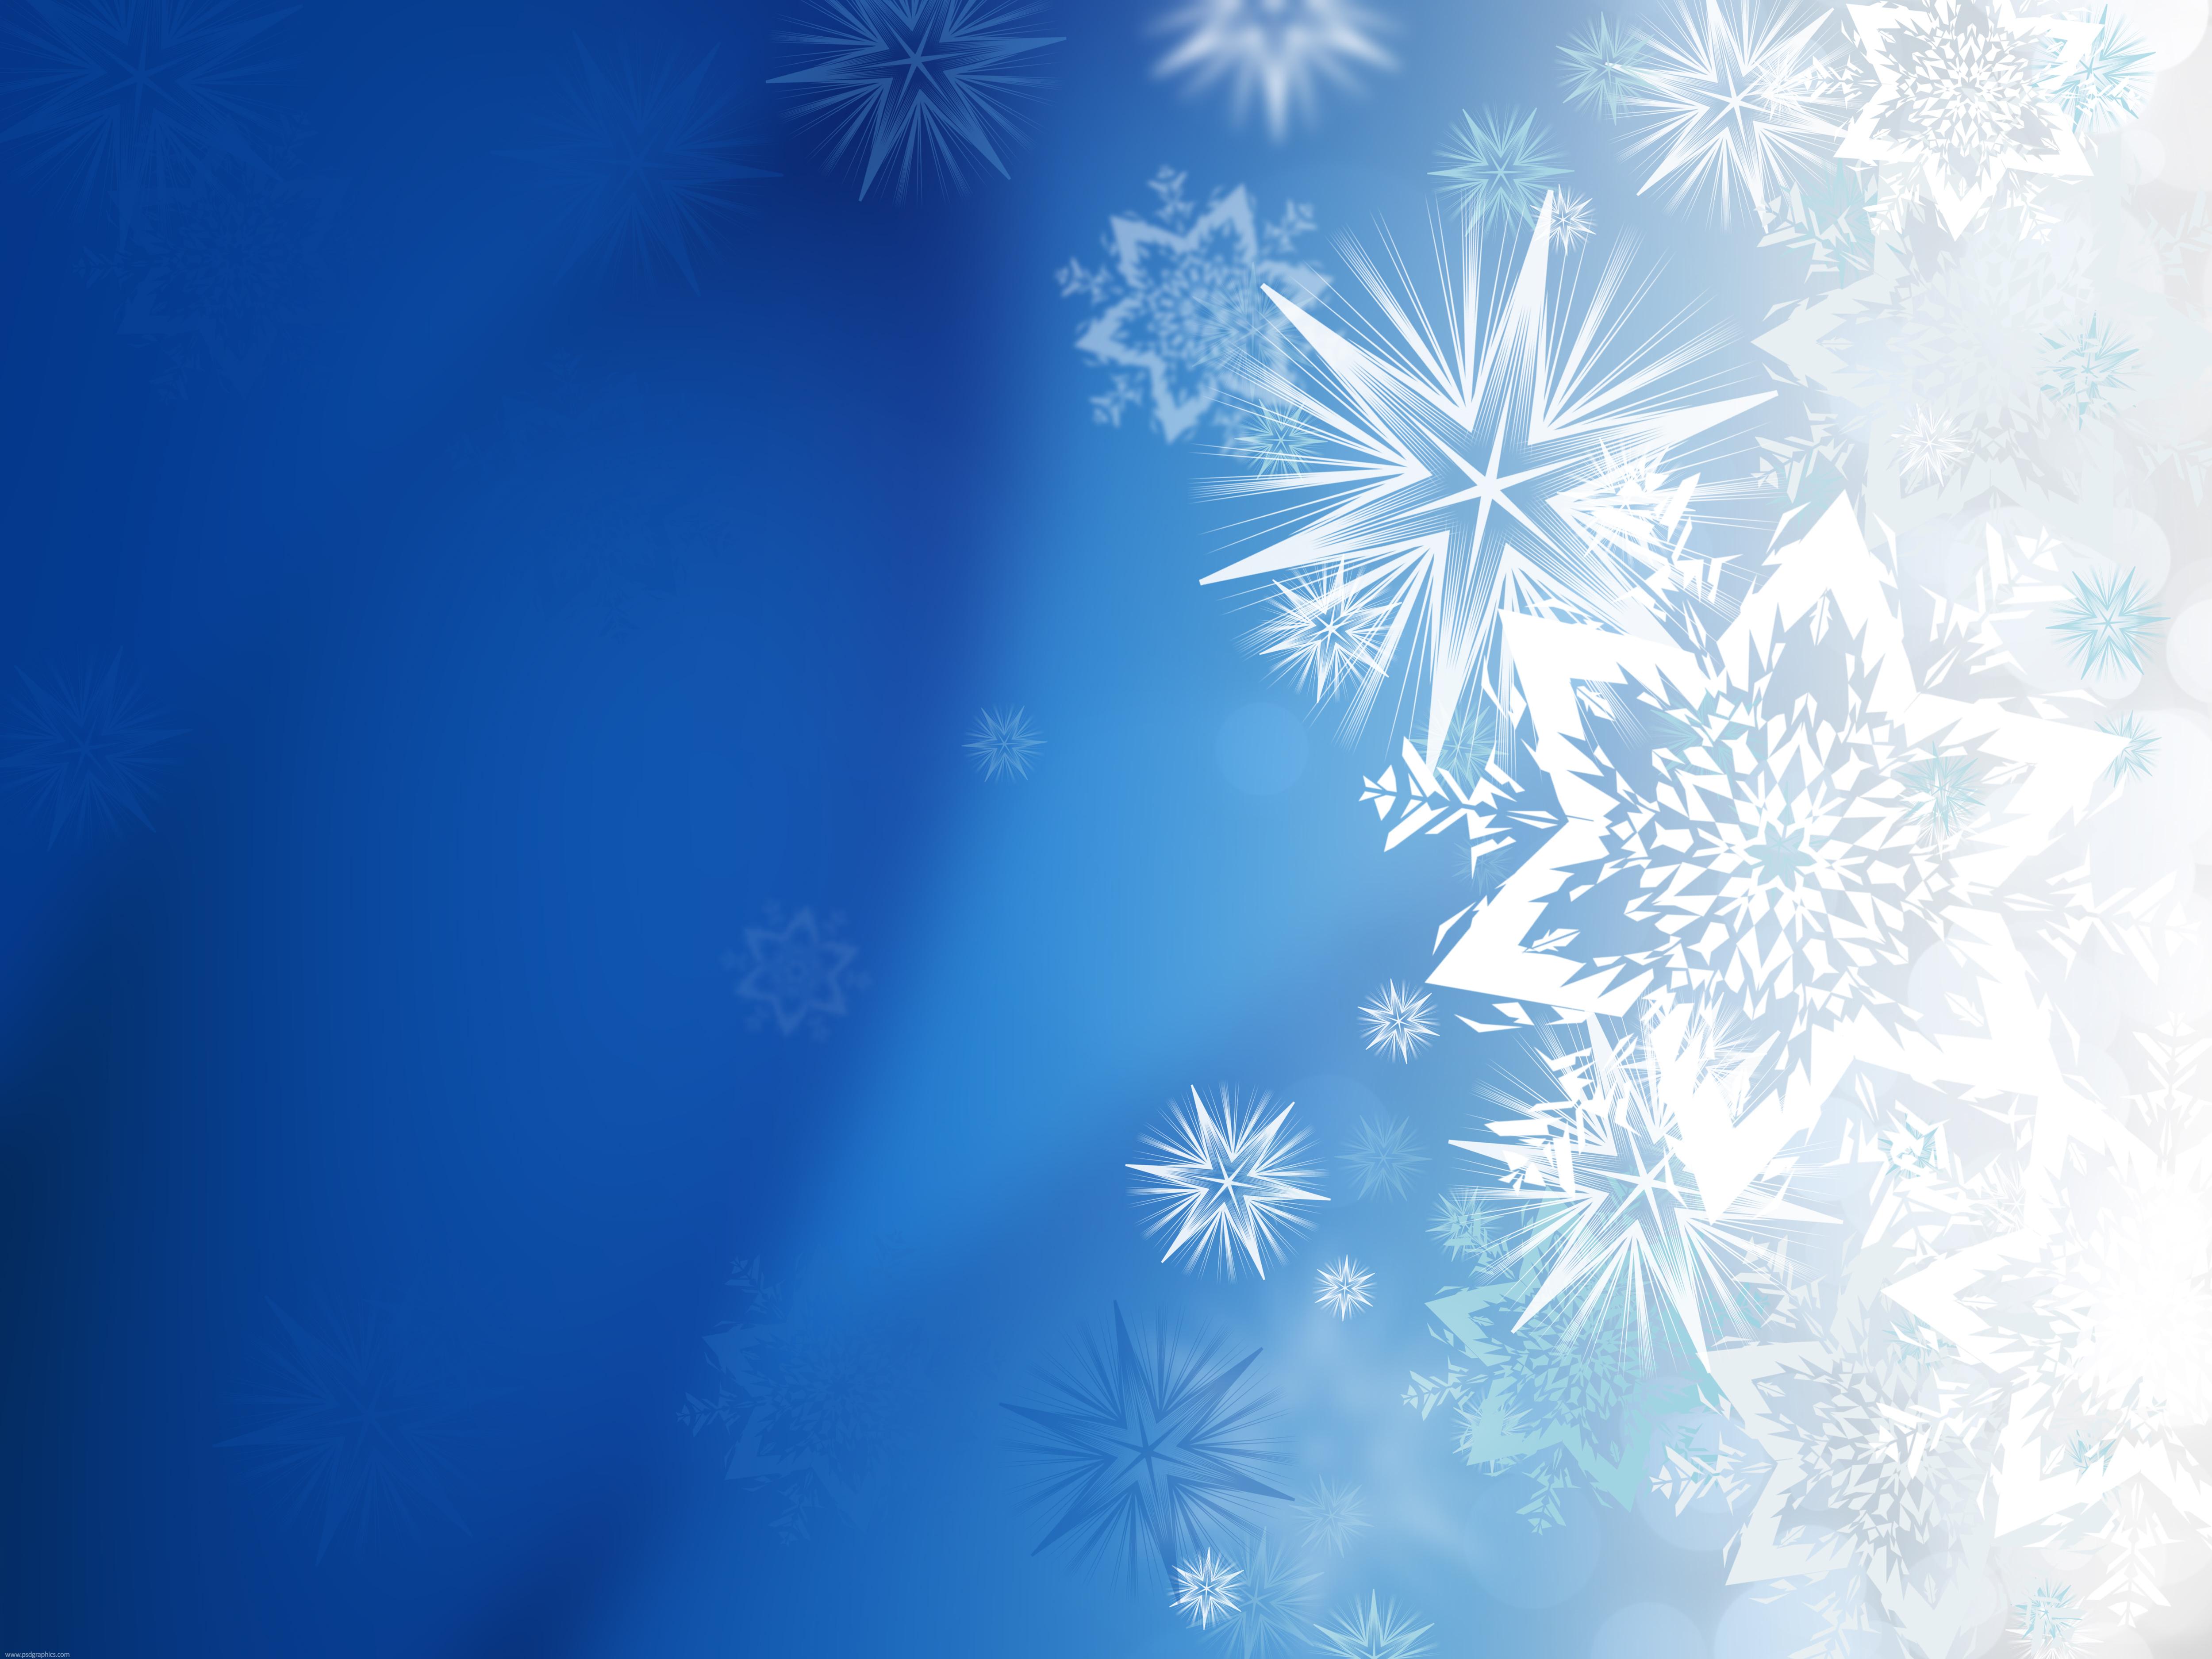 Magic winter snowflakes PSDGraphics 5000x3750